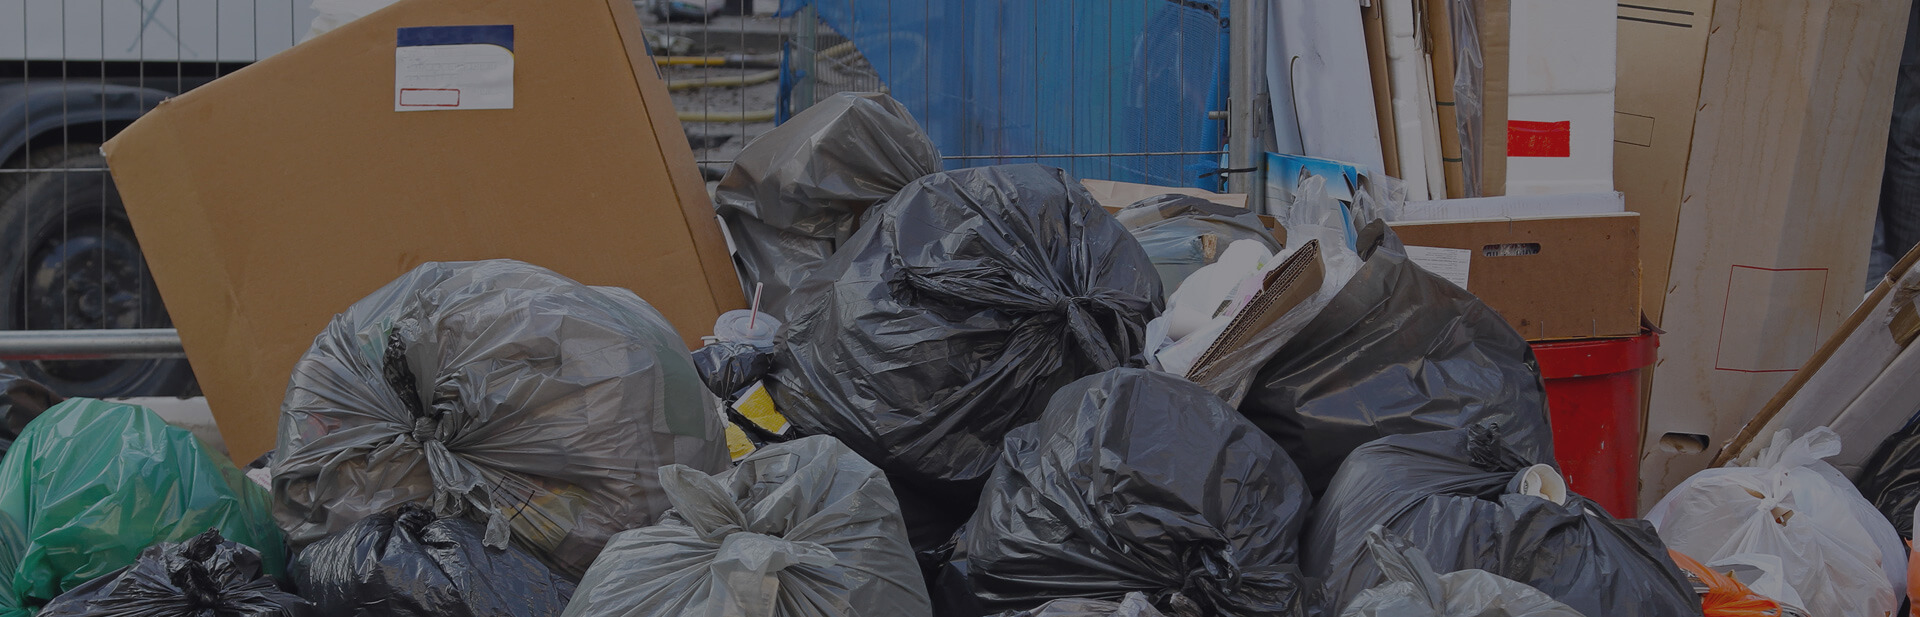 Junk Removal Company Pensacola FL